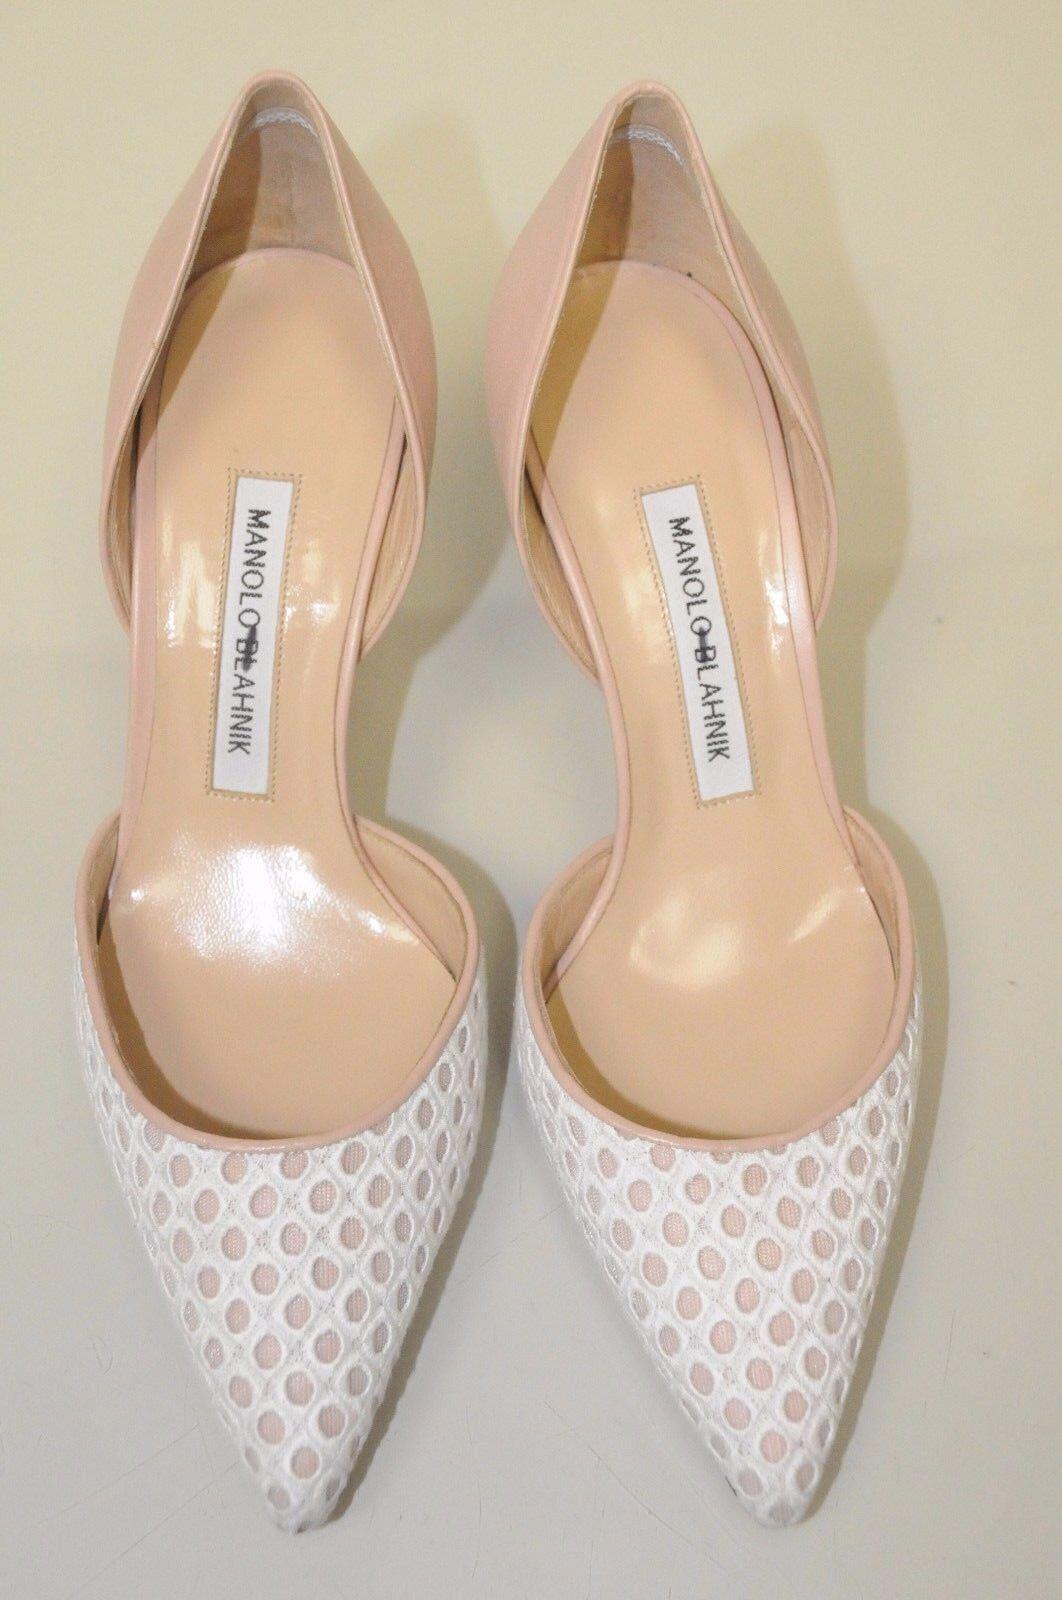 New Manolo Blahnik Tayler Nude bleush Lt Beige blanc Eyelet Eyelet Eyelet Pumps Dorsay chaussures 37 775ade